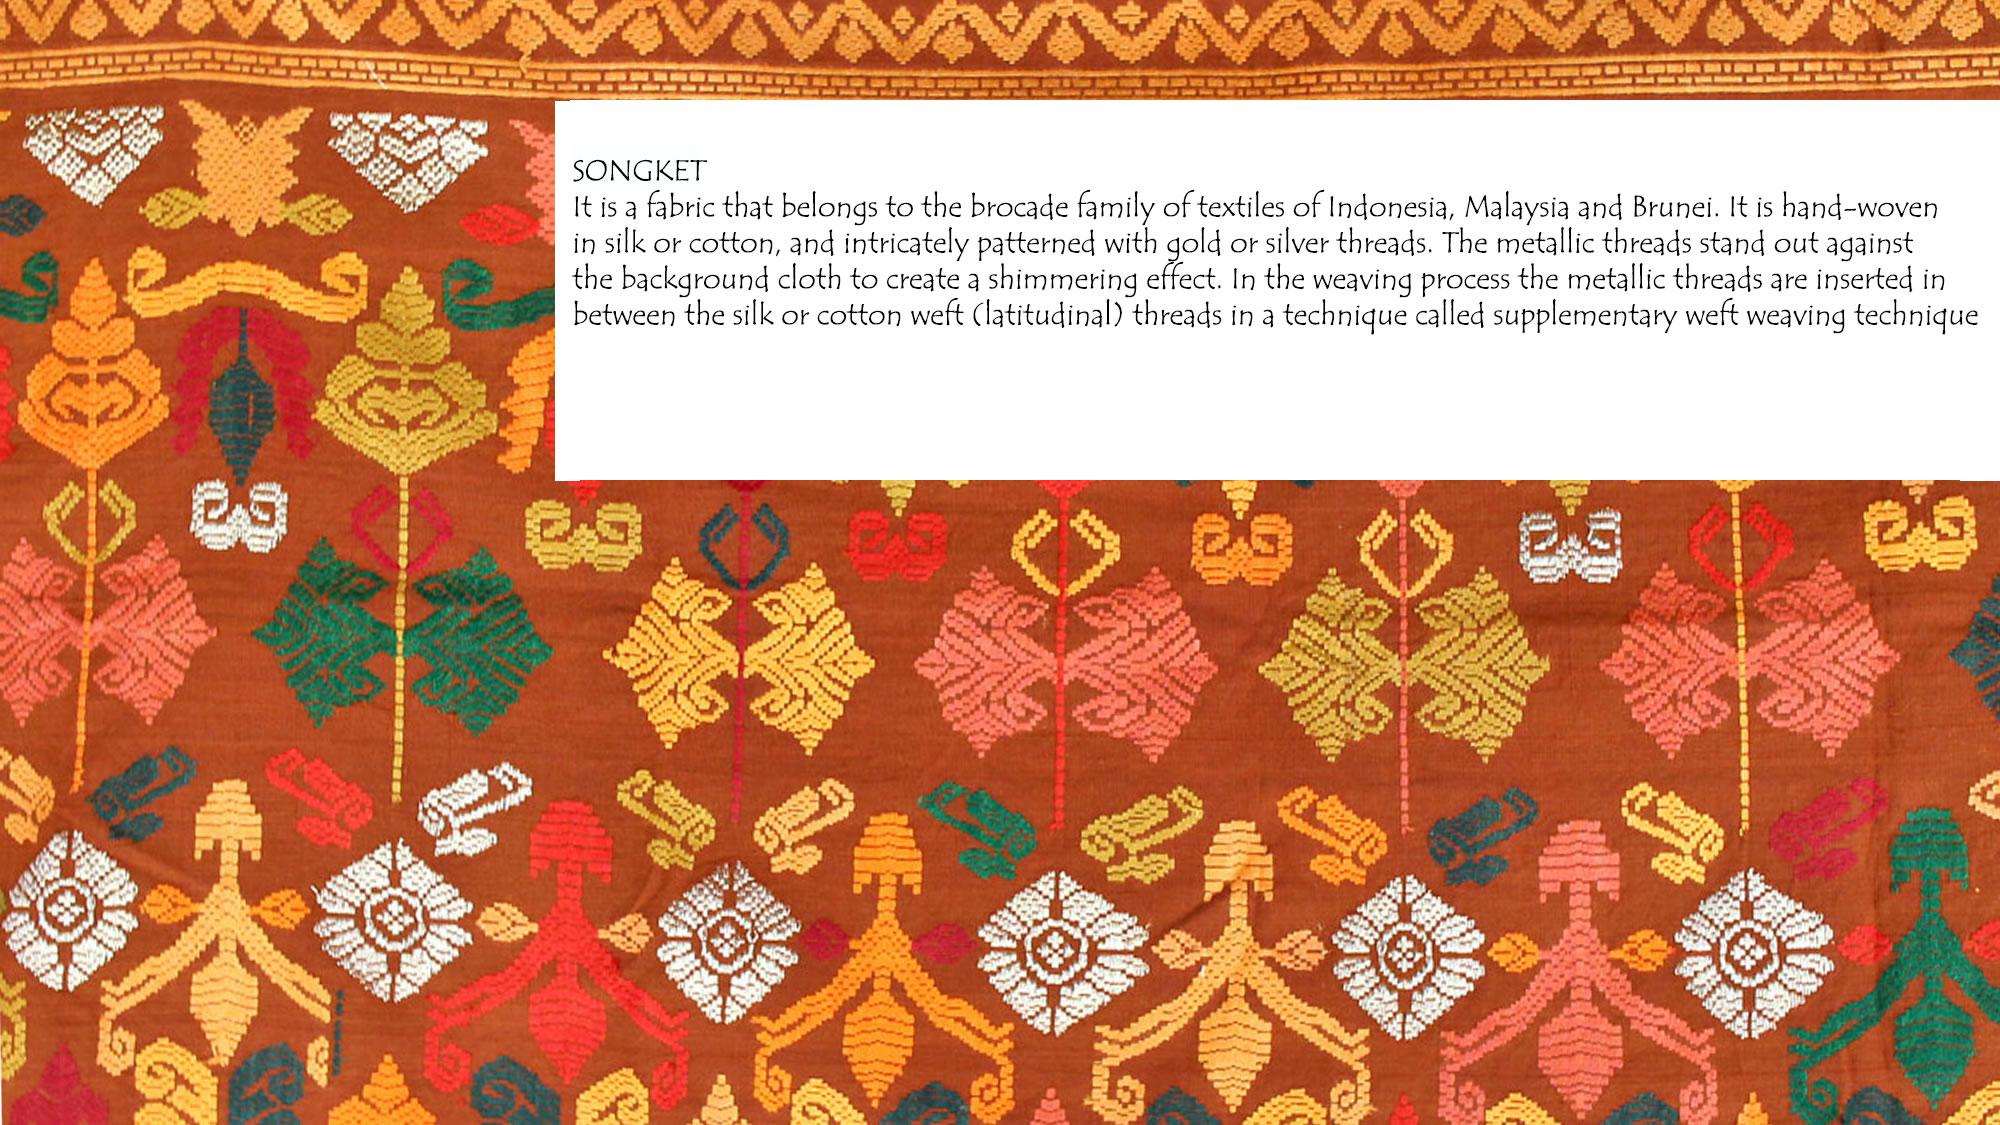 2- songket textiles techniques.jpg